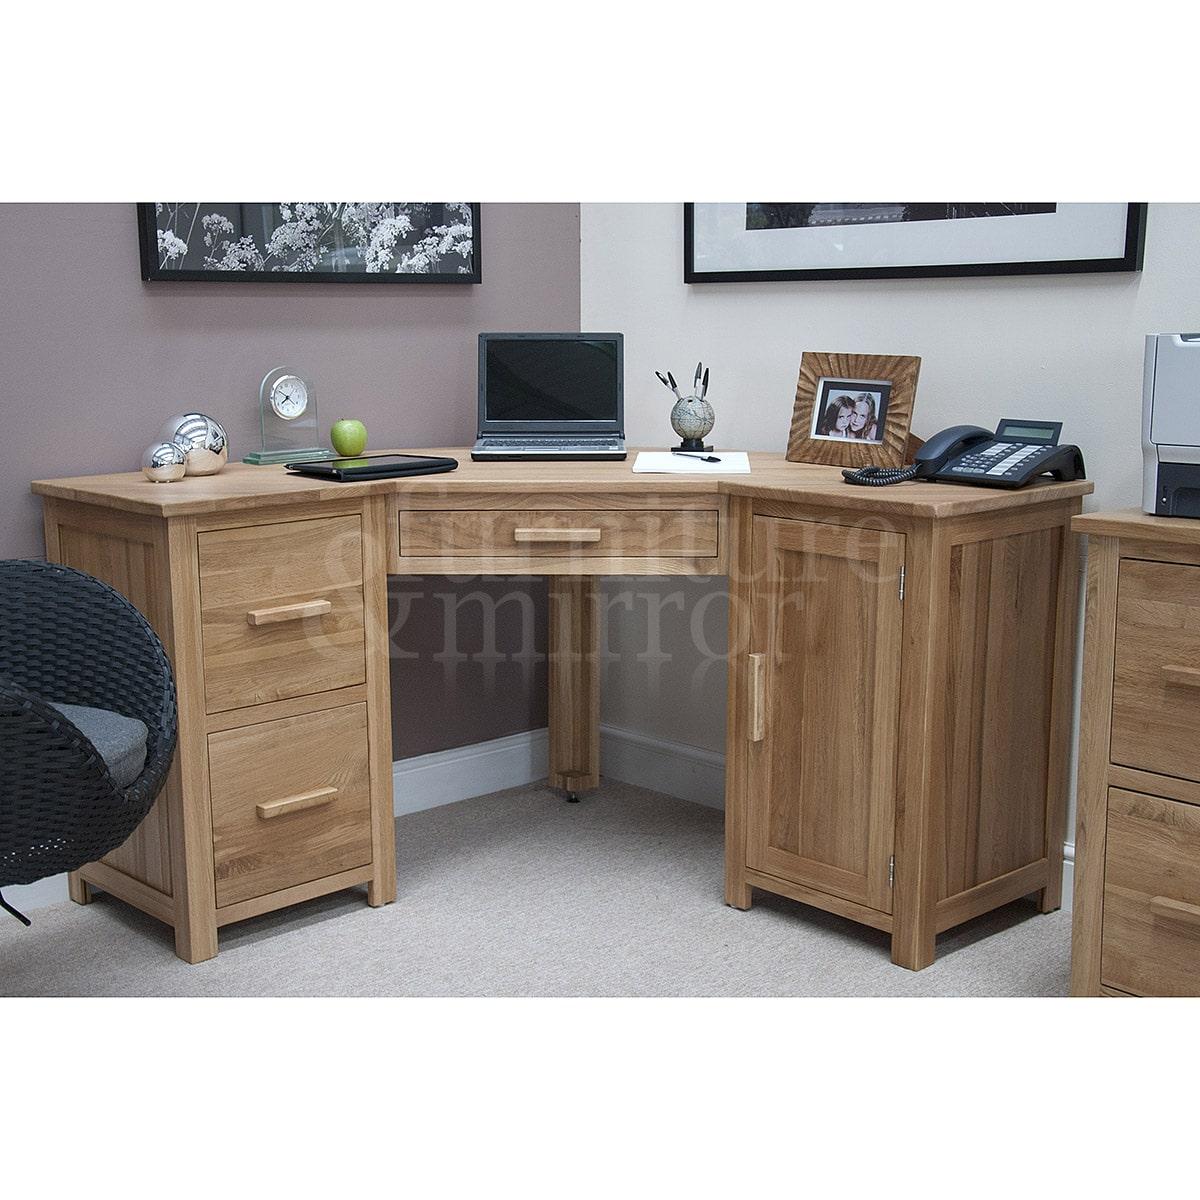 Oregon corner computer desk furniture and mirror for Furniture and mirror